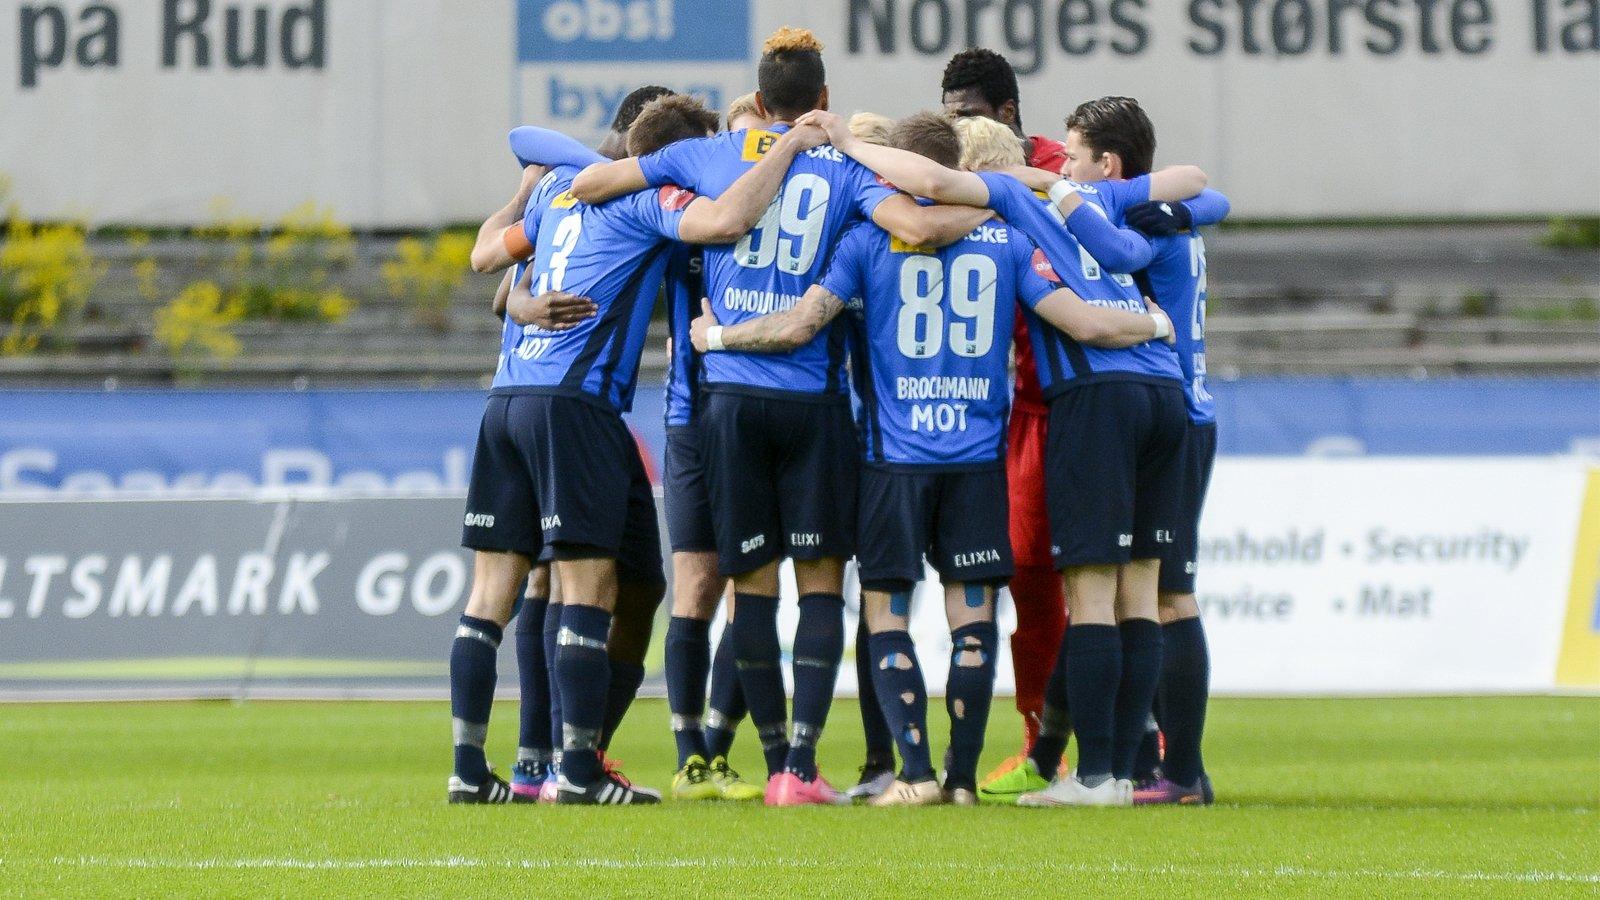 For Kampen Molde Stabaek